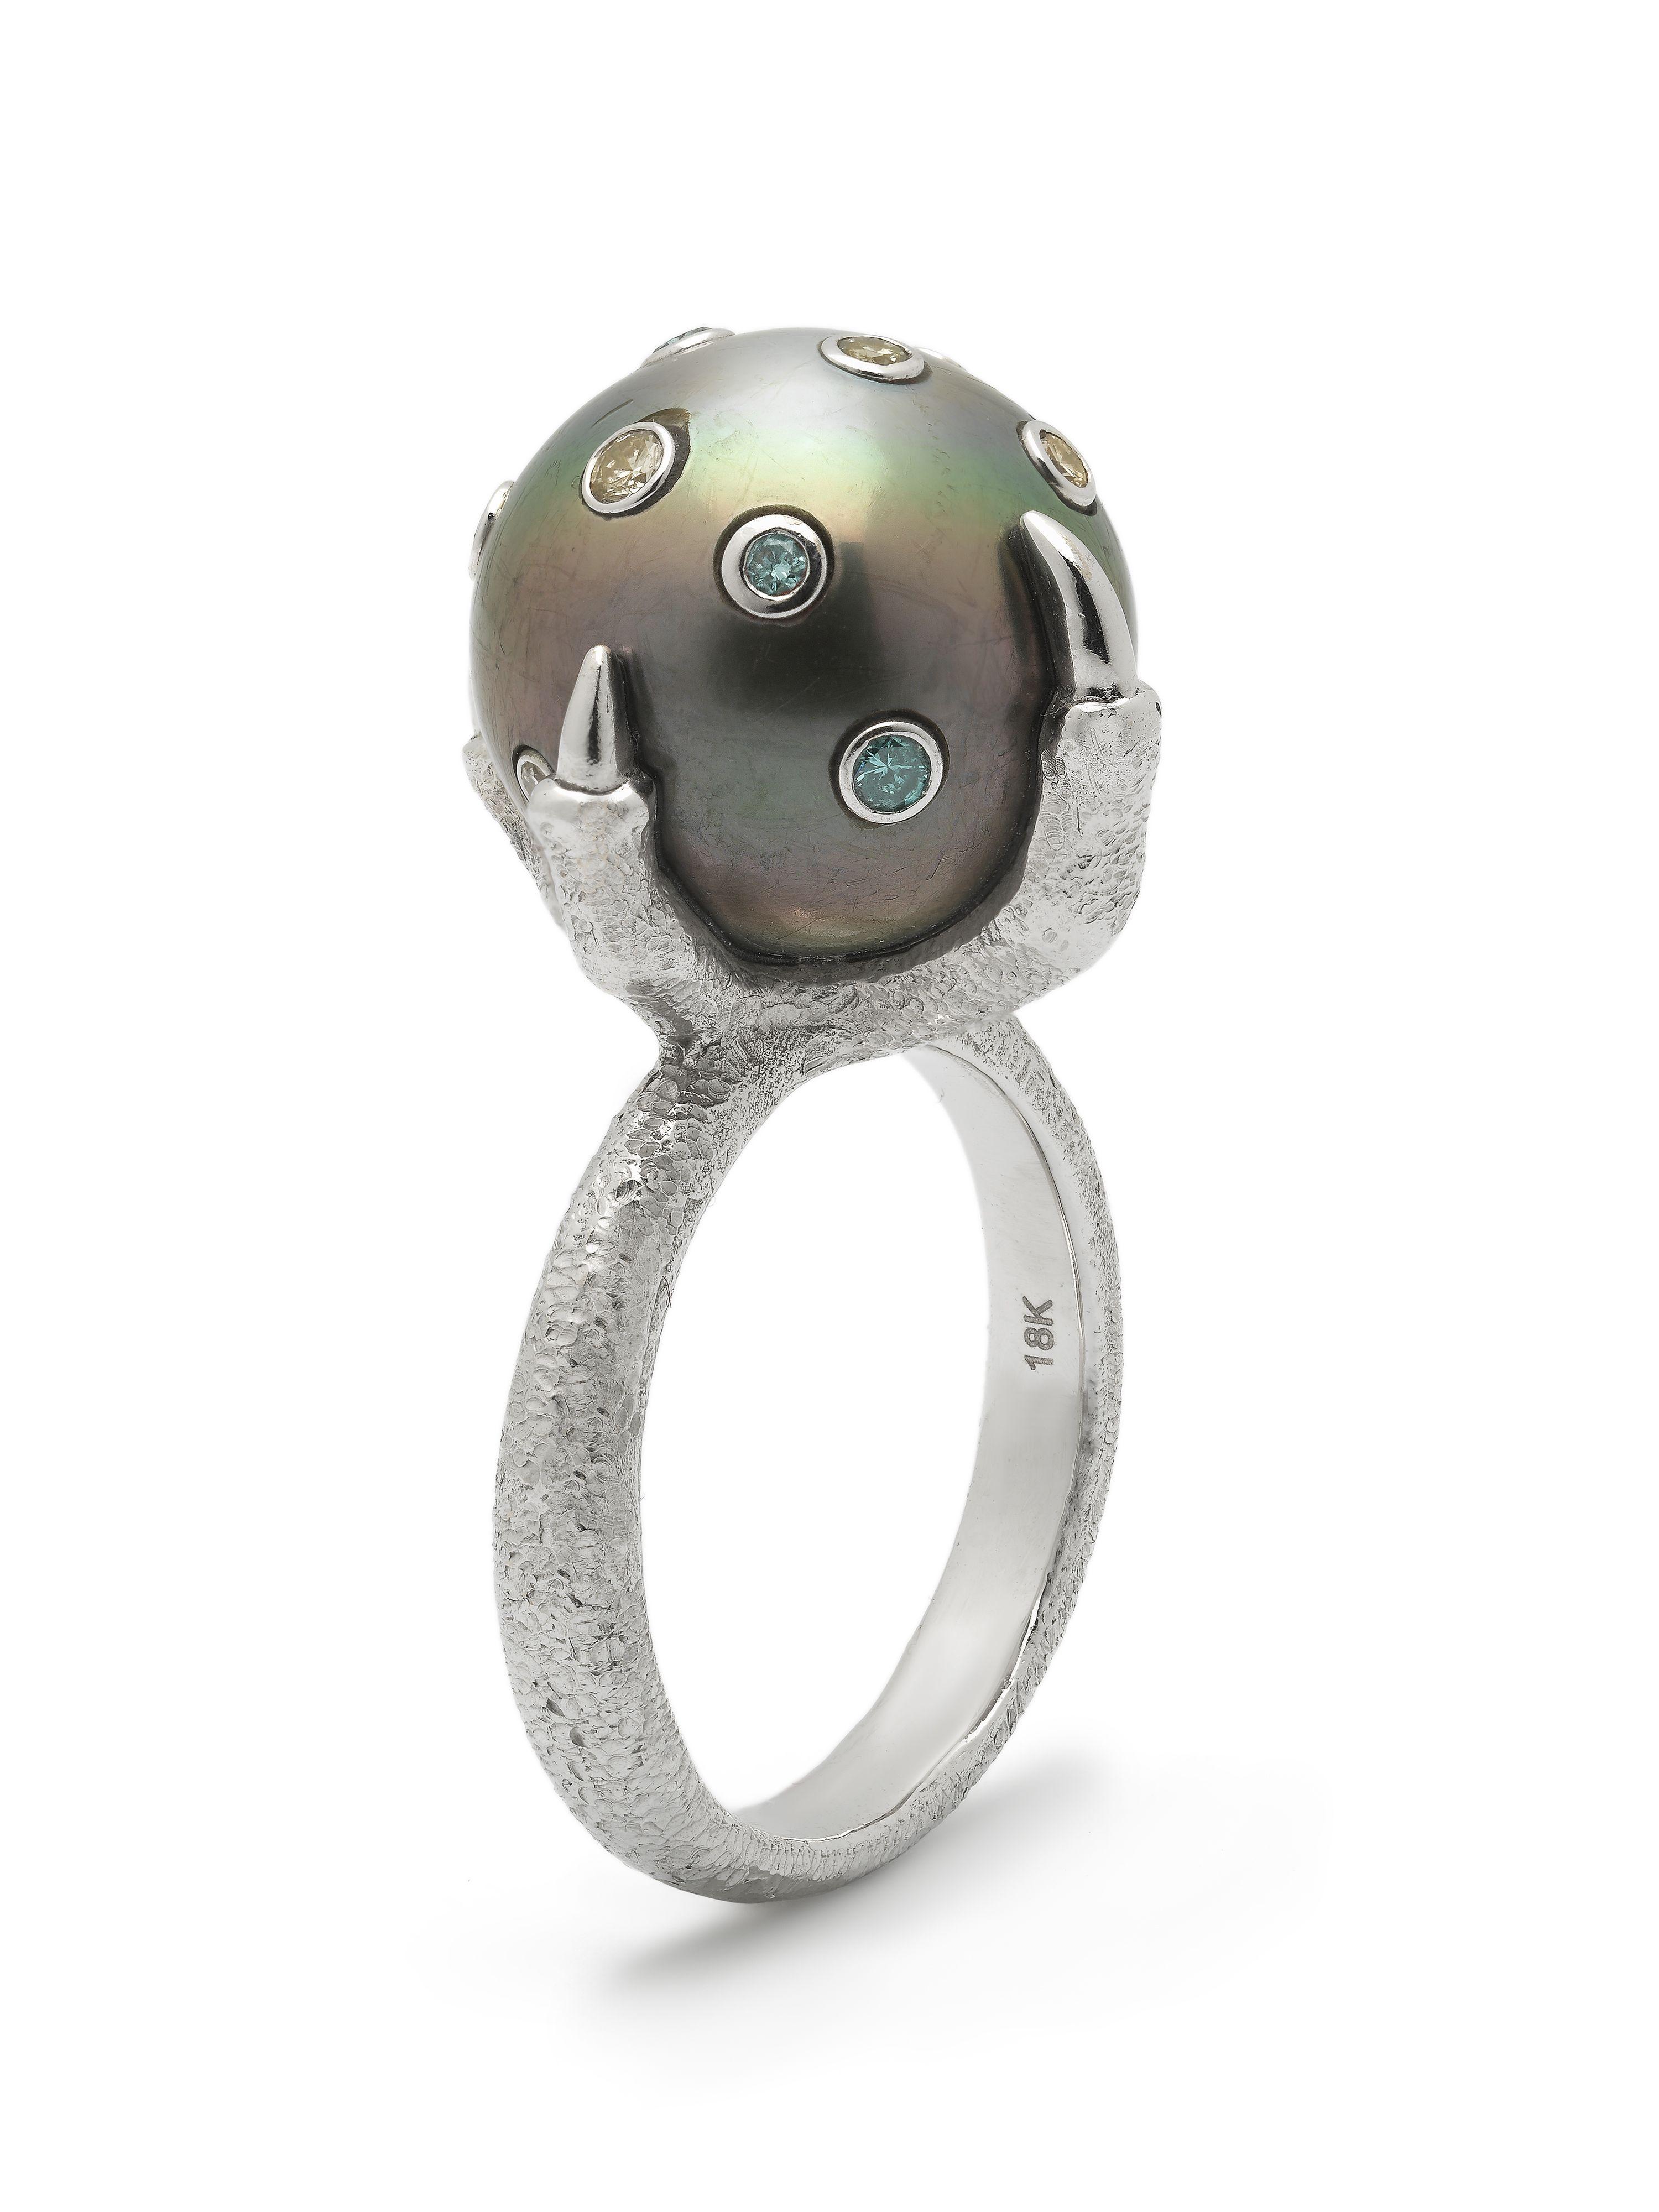 Bibi van der Velden, Baroque Pearl Collection, Tahitian Pearl Claw Ring.